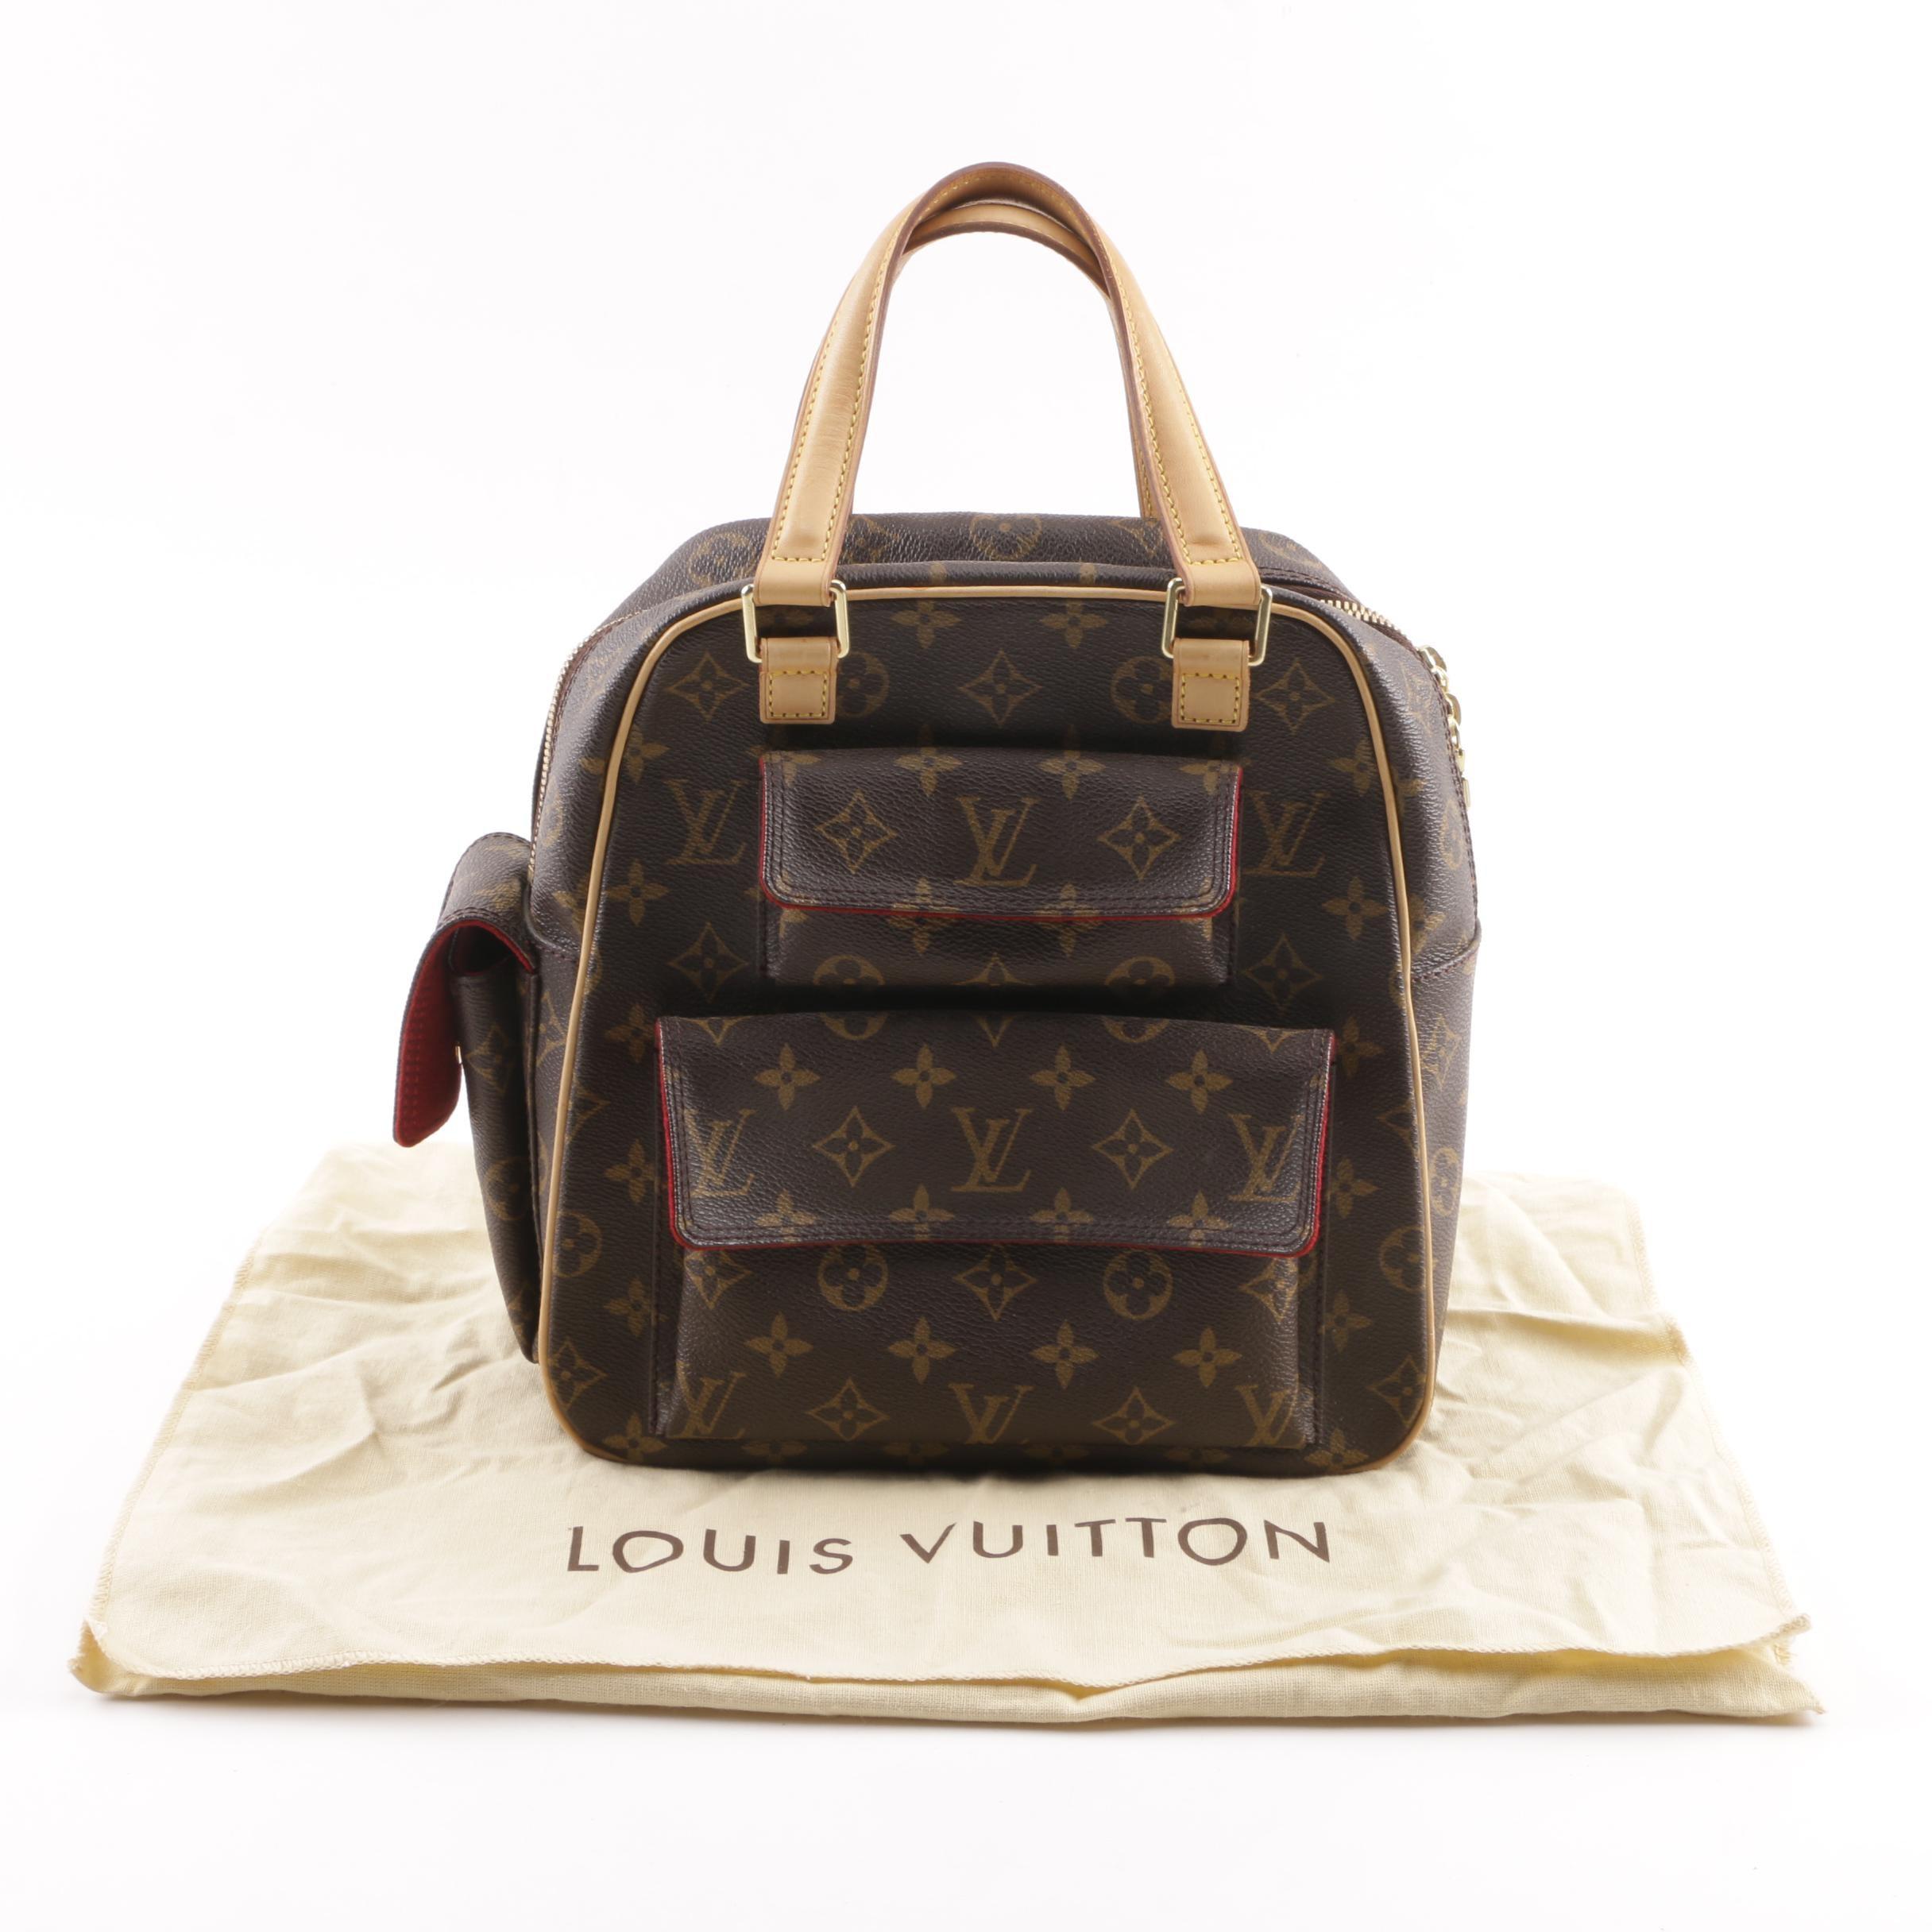 2004 Louis Vuitton Paris Excentri Cite Monogram Canvas Satchel Handbag